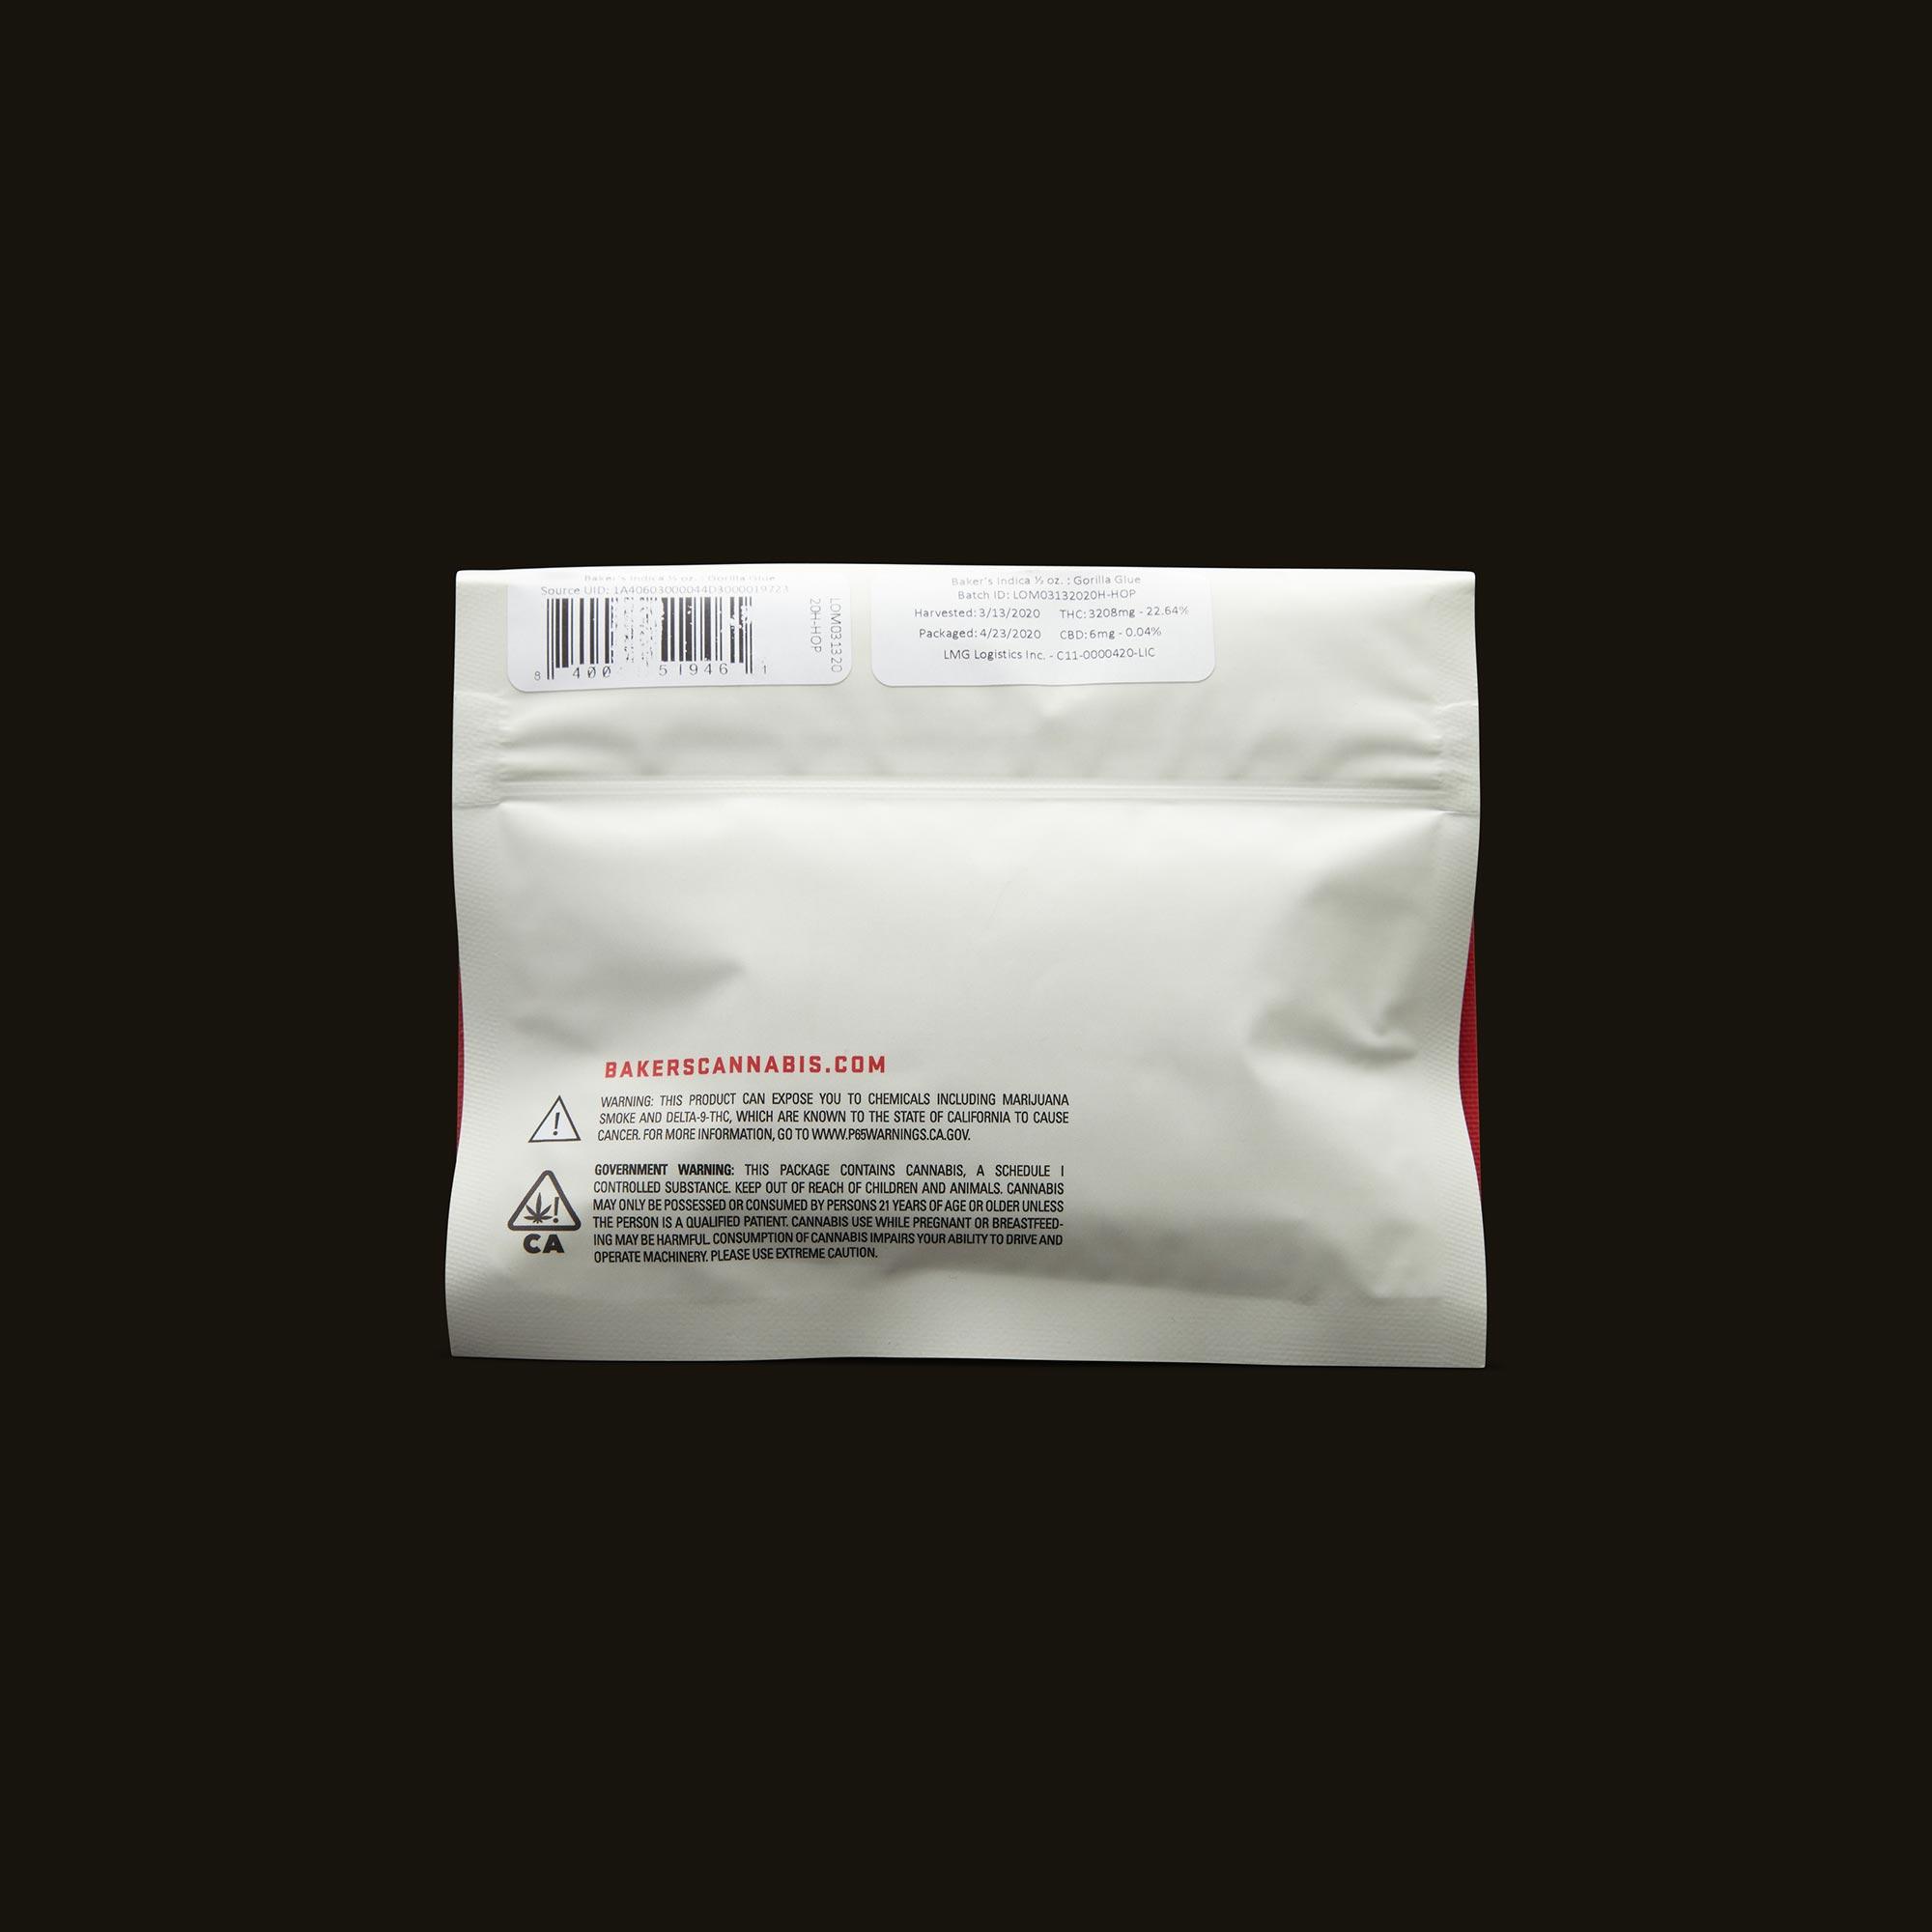 Baker's Gorilla Glue Pre-Ground Half Ounce Back Packaging